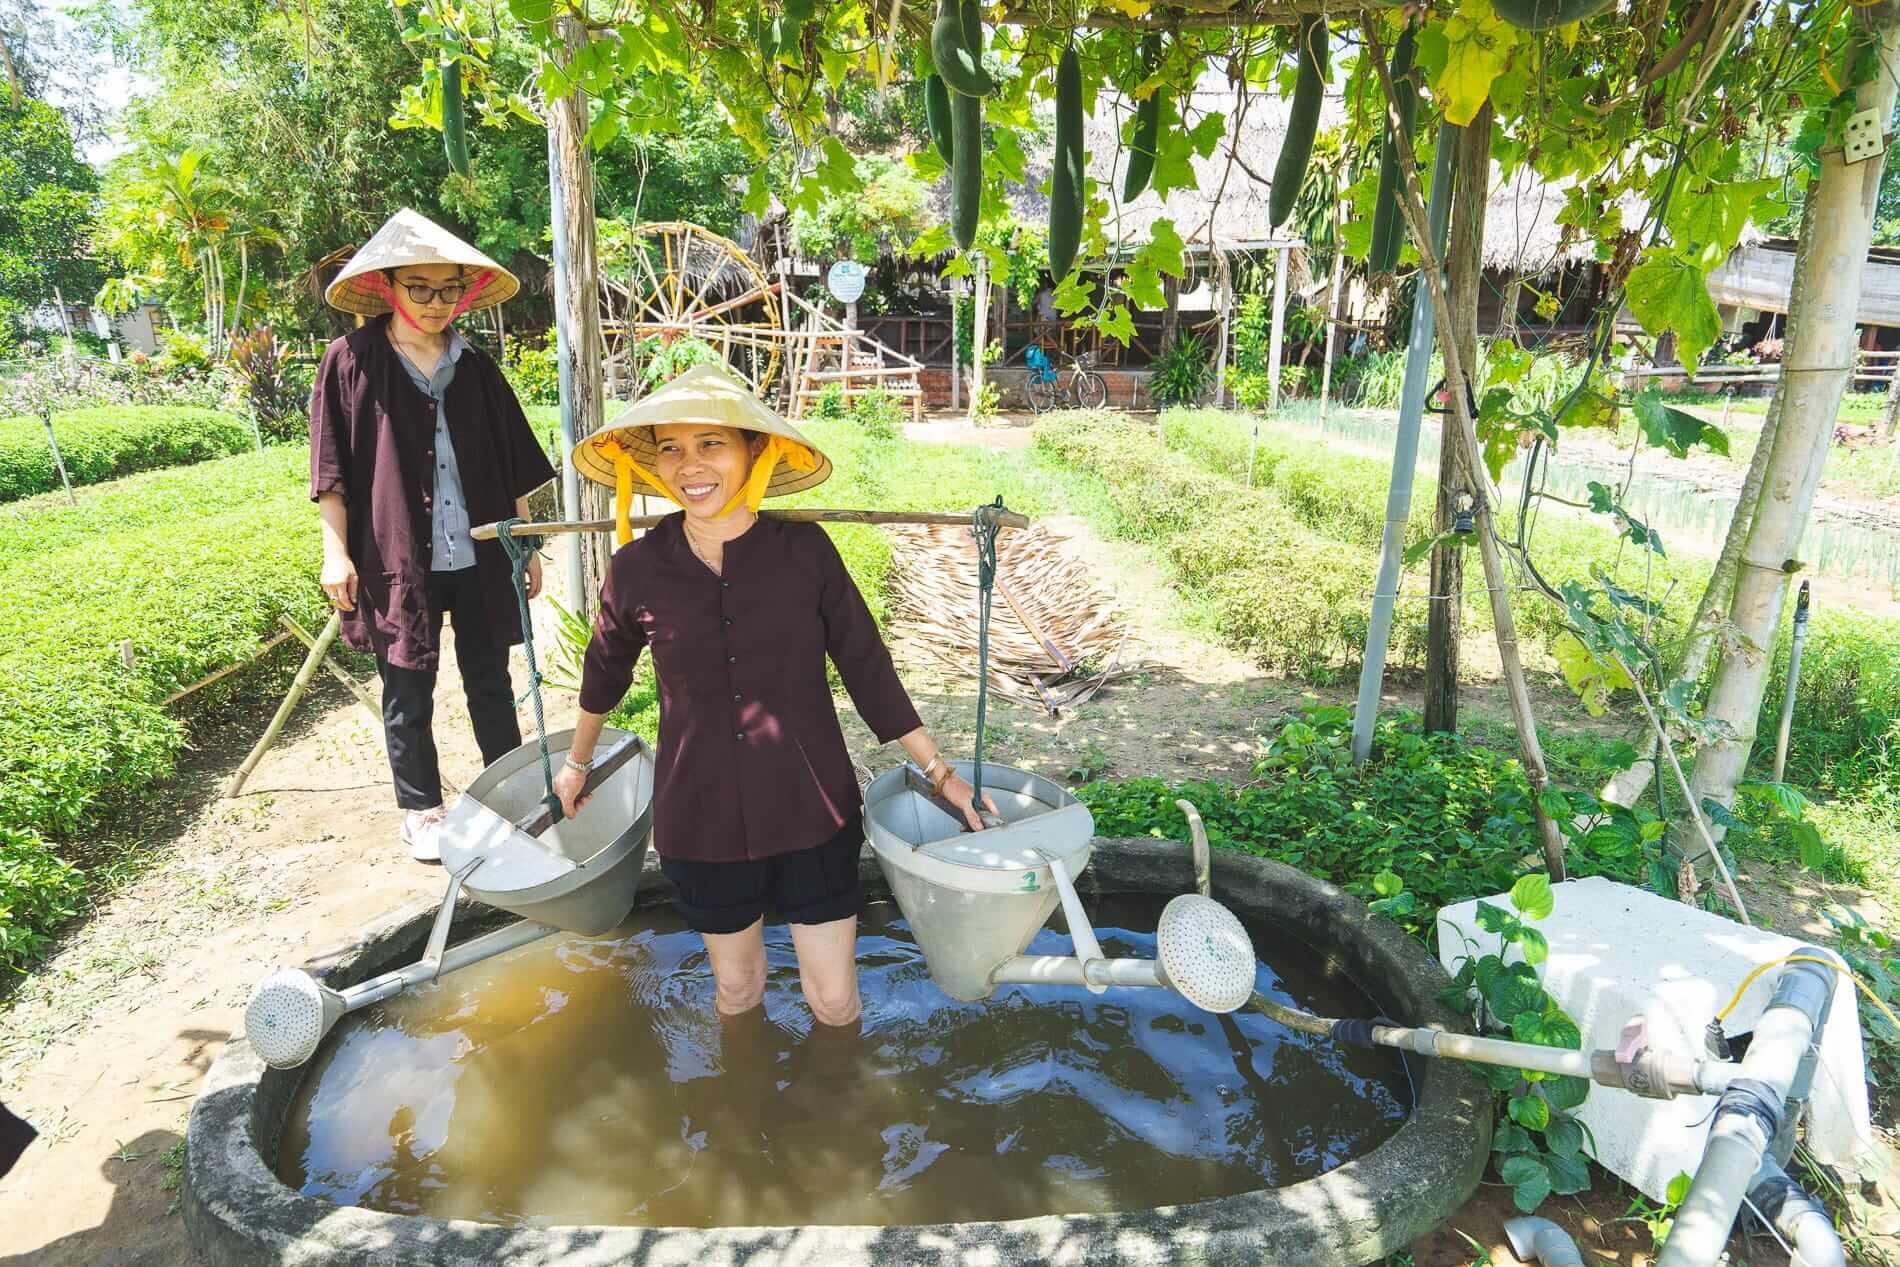 Farm life on a tour - Tra Que Vegetable Village